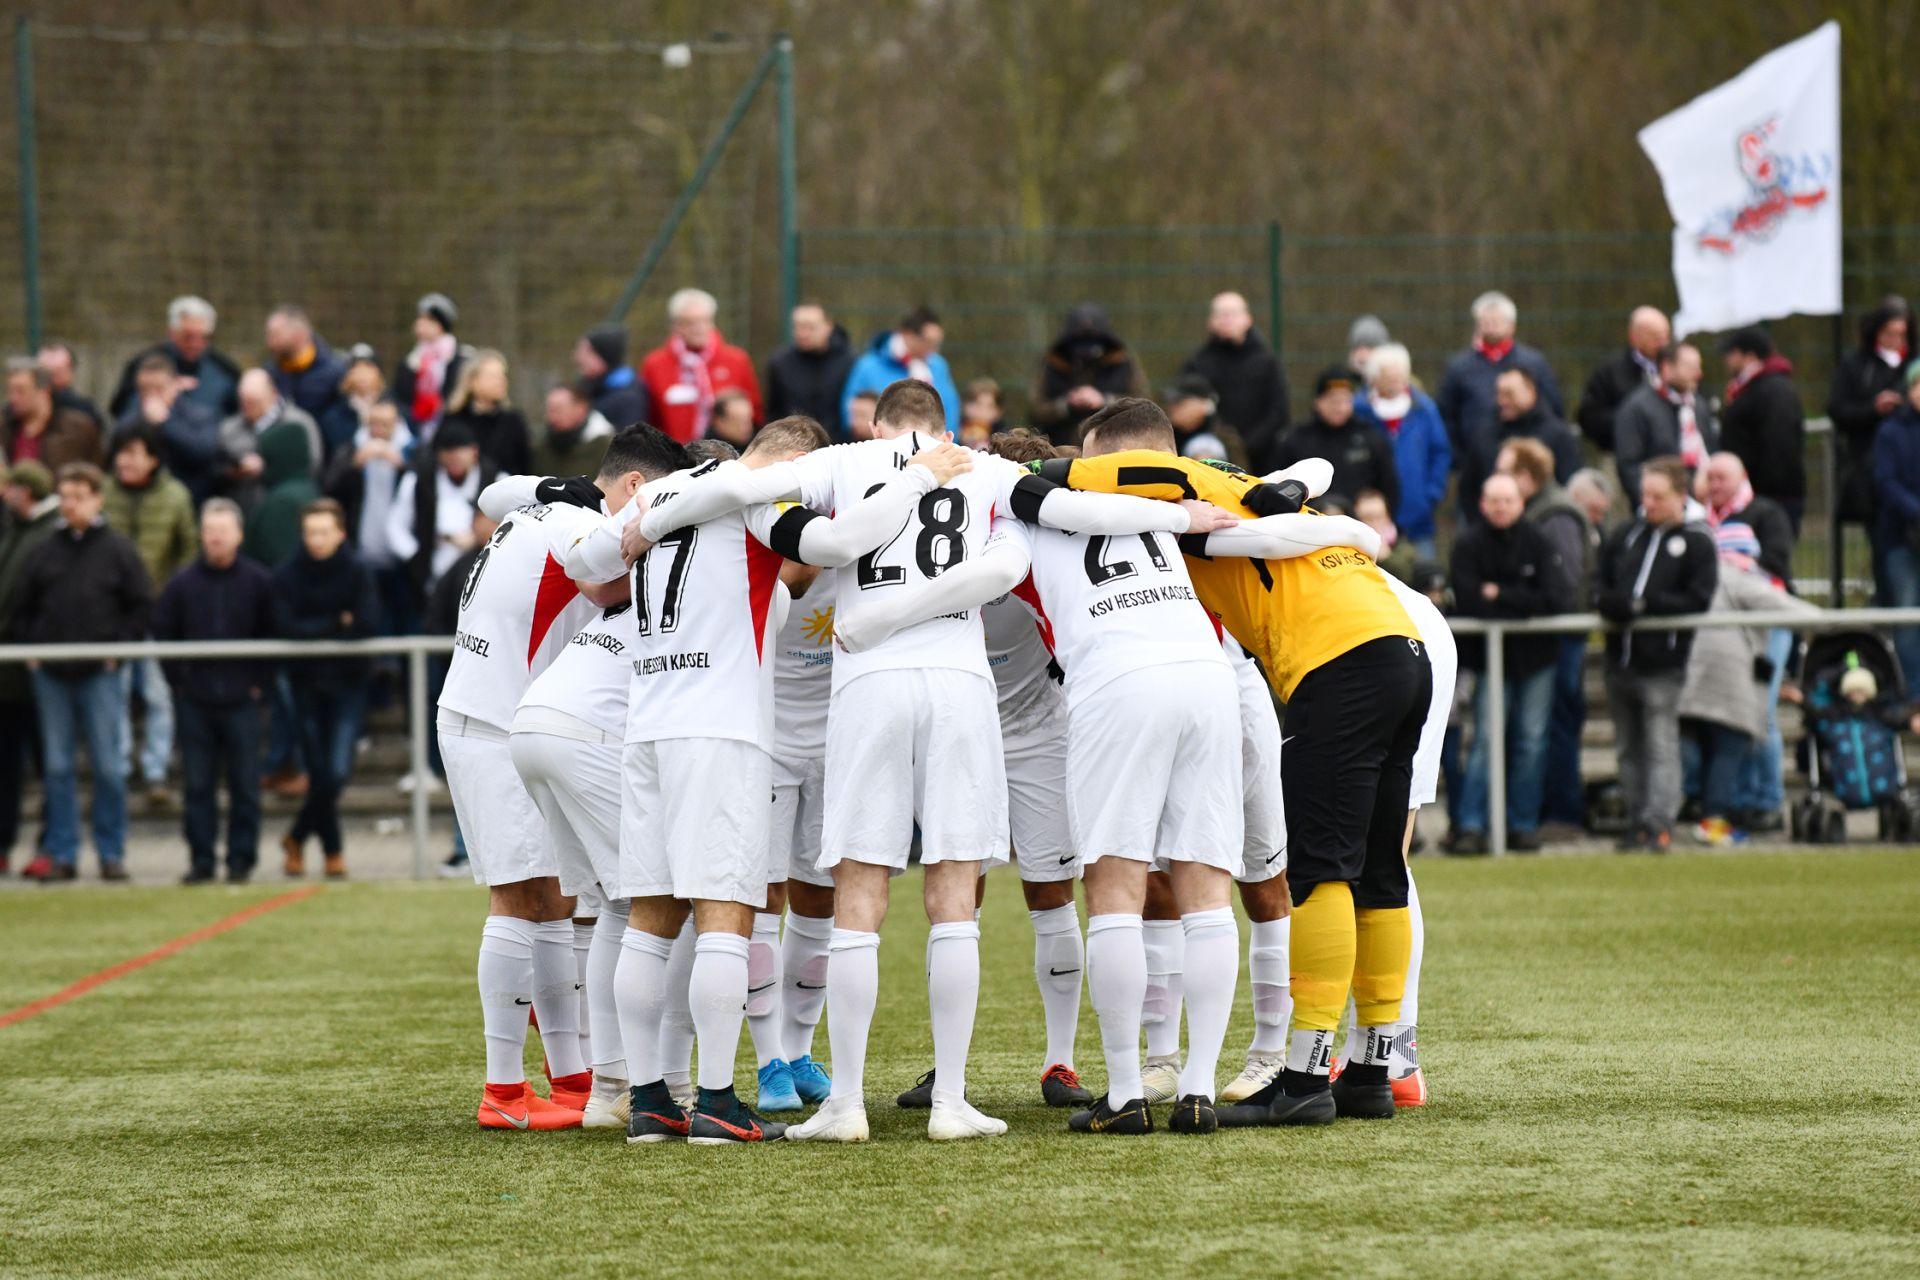 KSV Hessen Kassel, KSV Baunatal, Kreispokal, Viertelfinale, Endstand 4:2